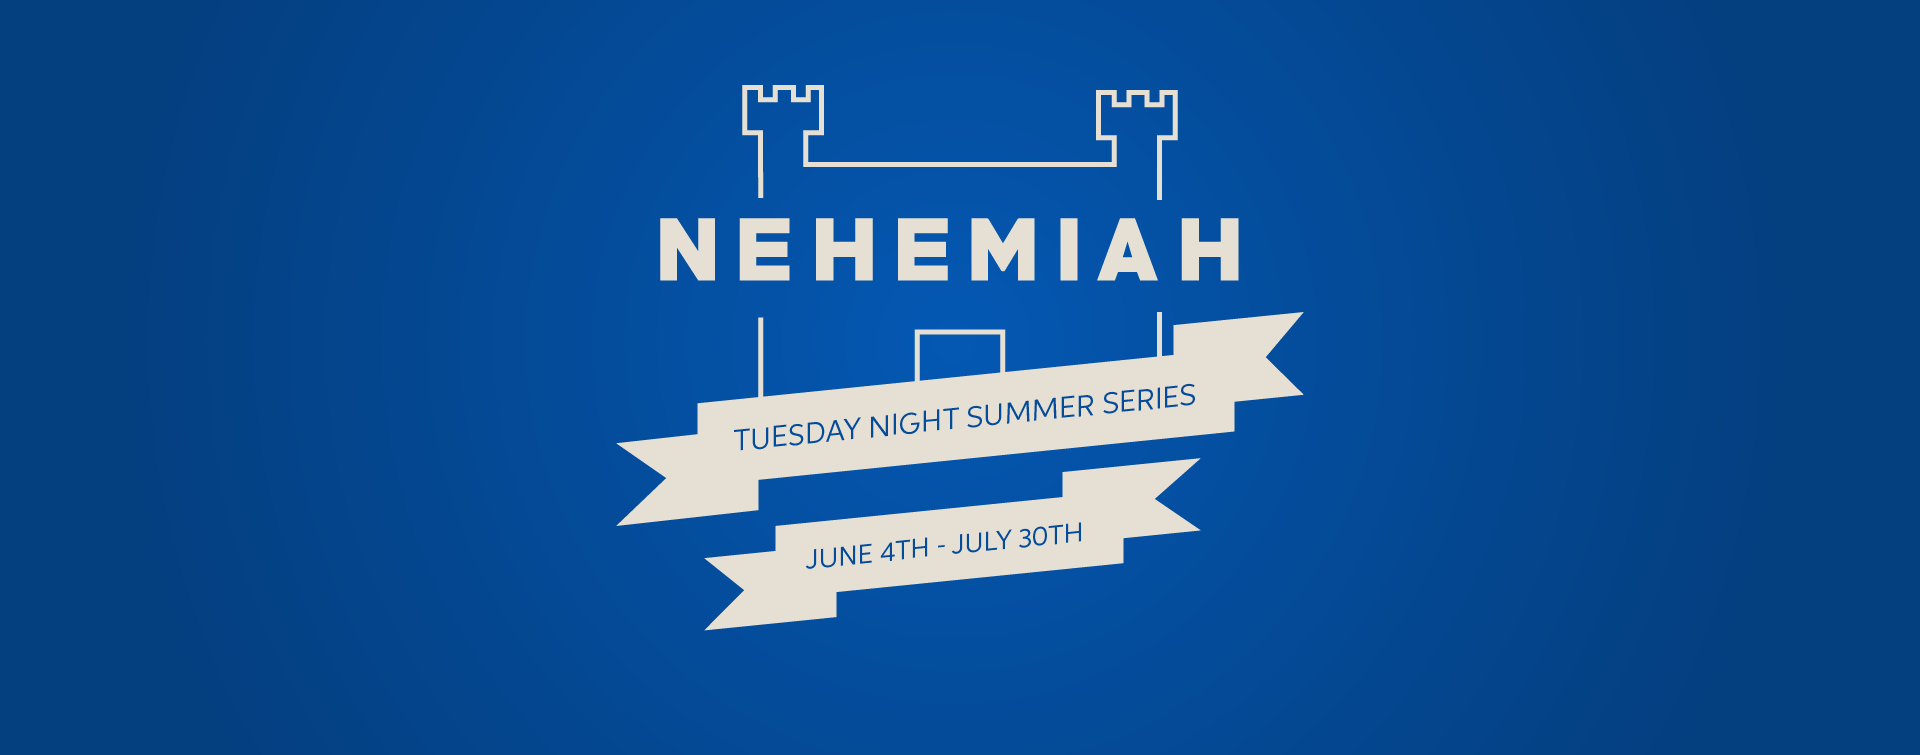 Nehemiah-BS-BANNER.png